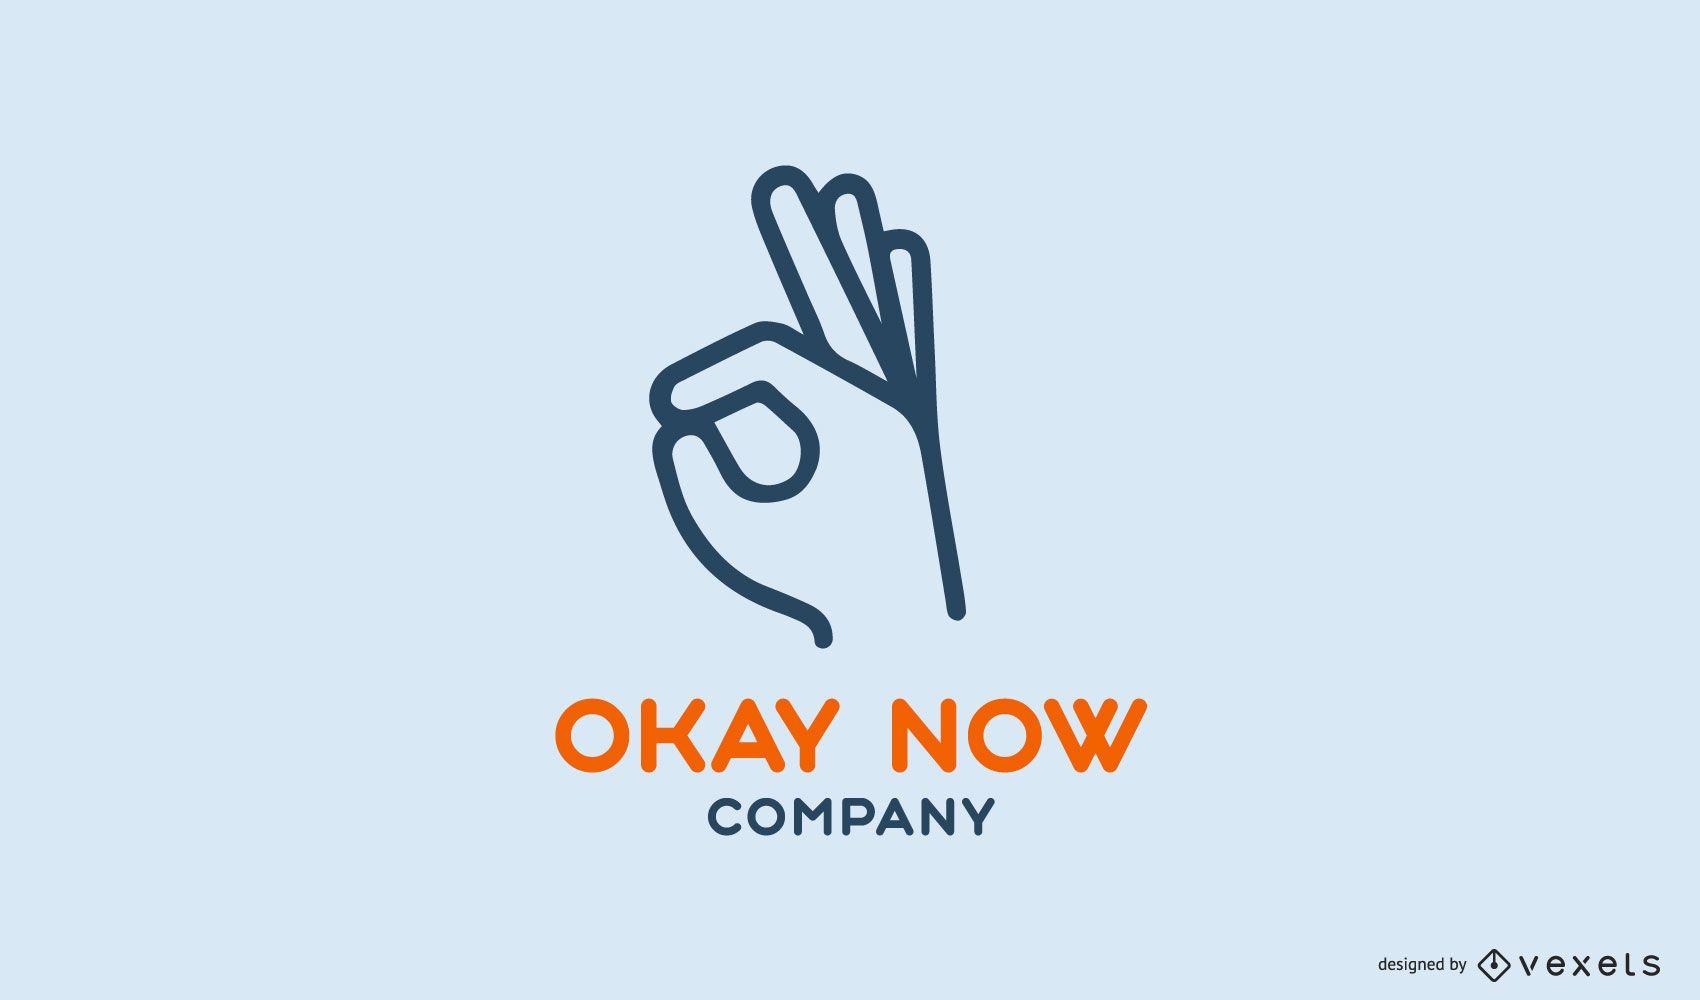 Okay now company logo template